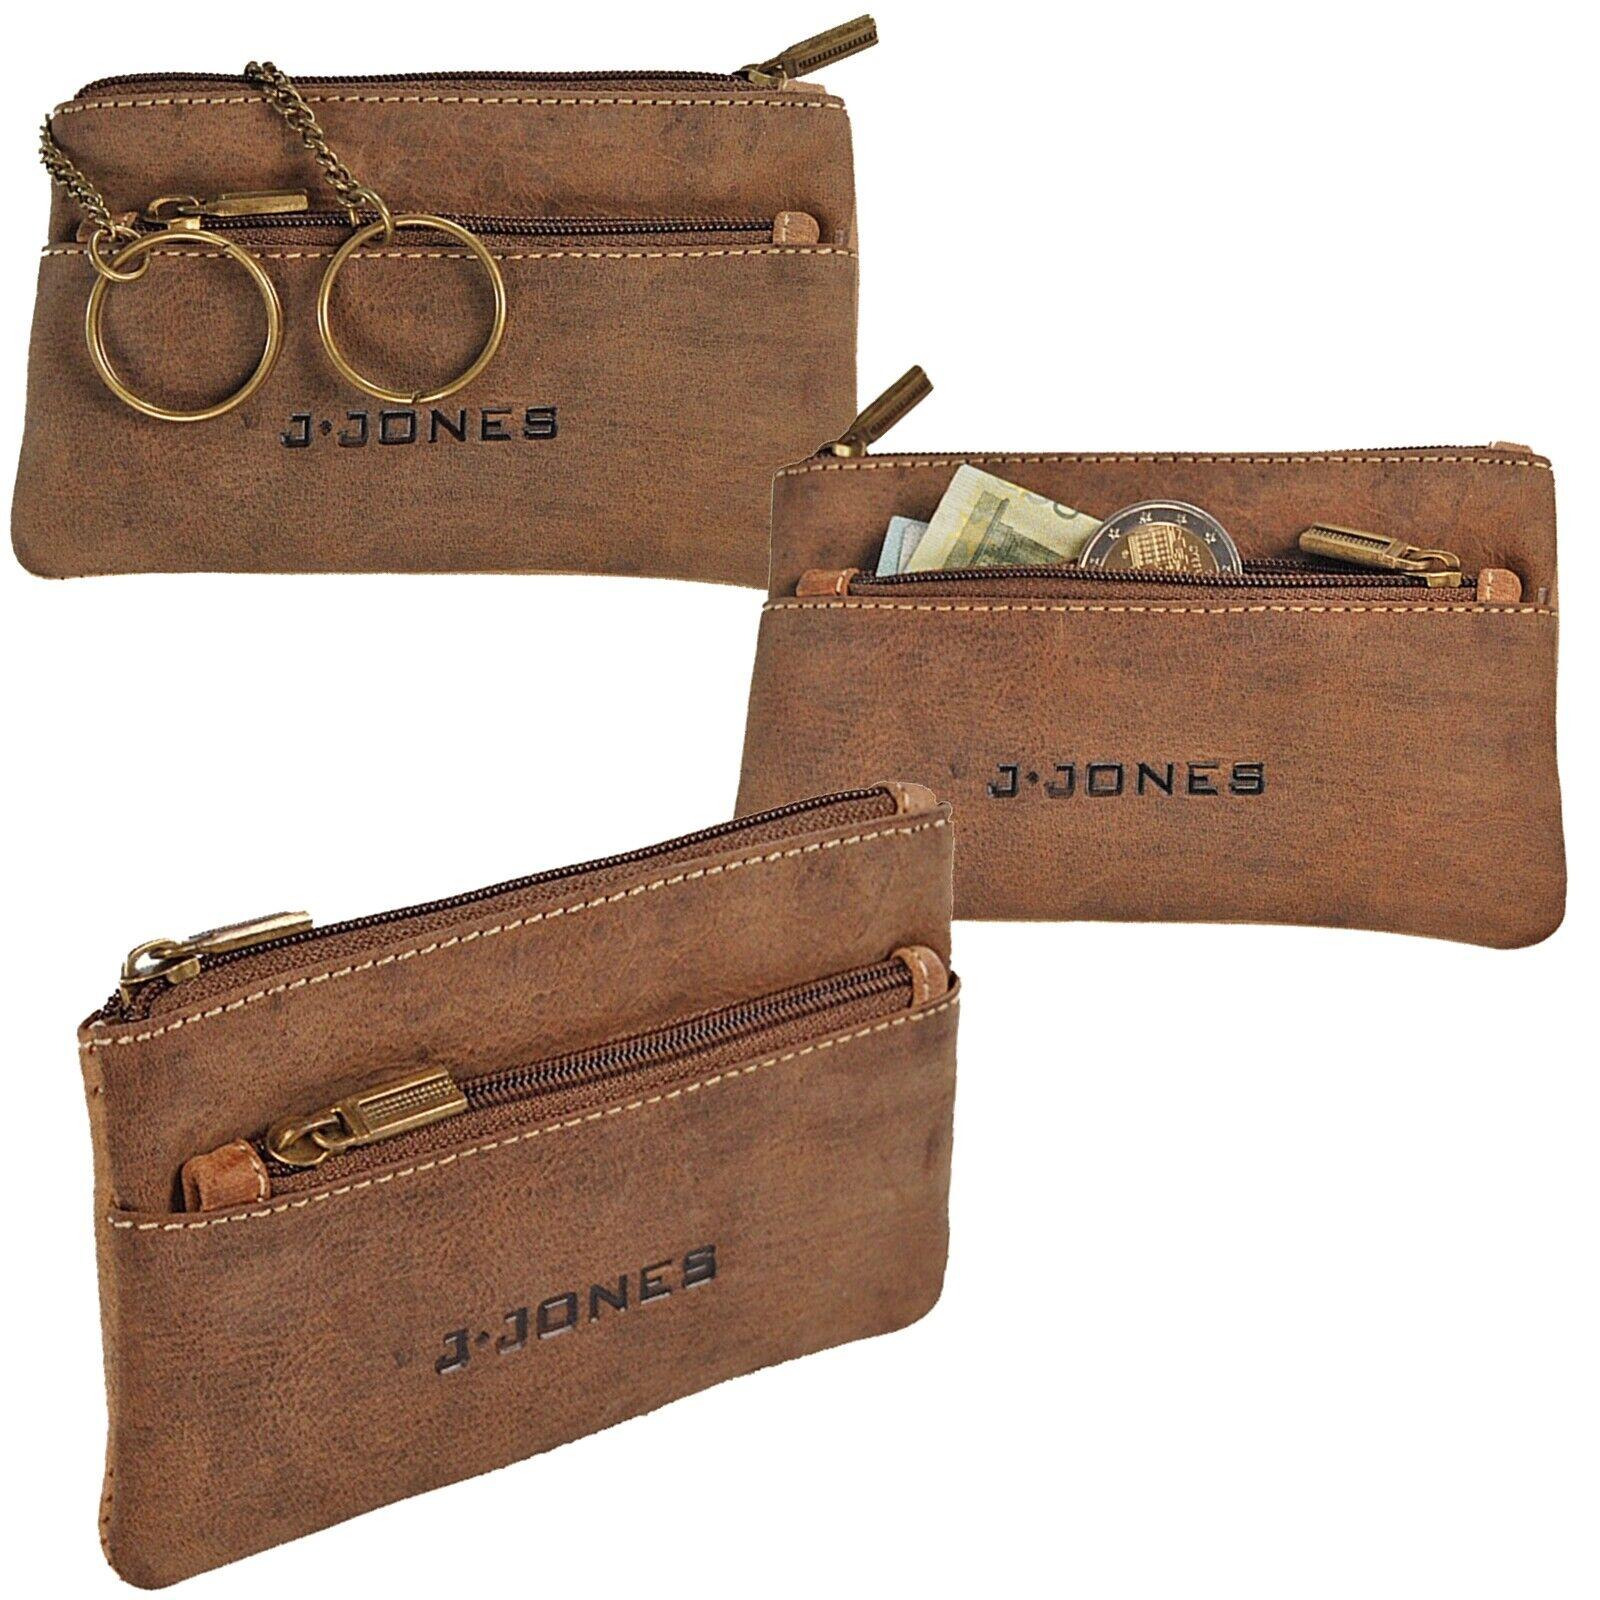 J.Jones Schlüsseltasche Echt Leder Schlüsseletui Schlüsselmappe Haustürschlüssel